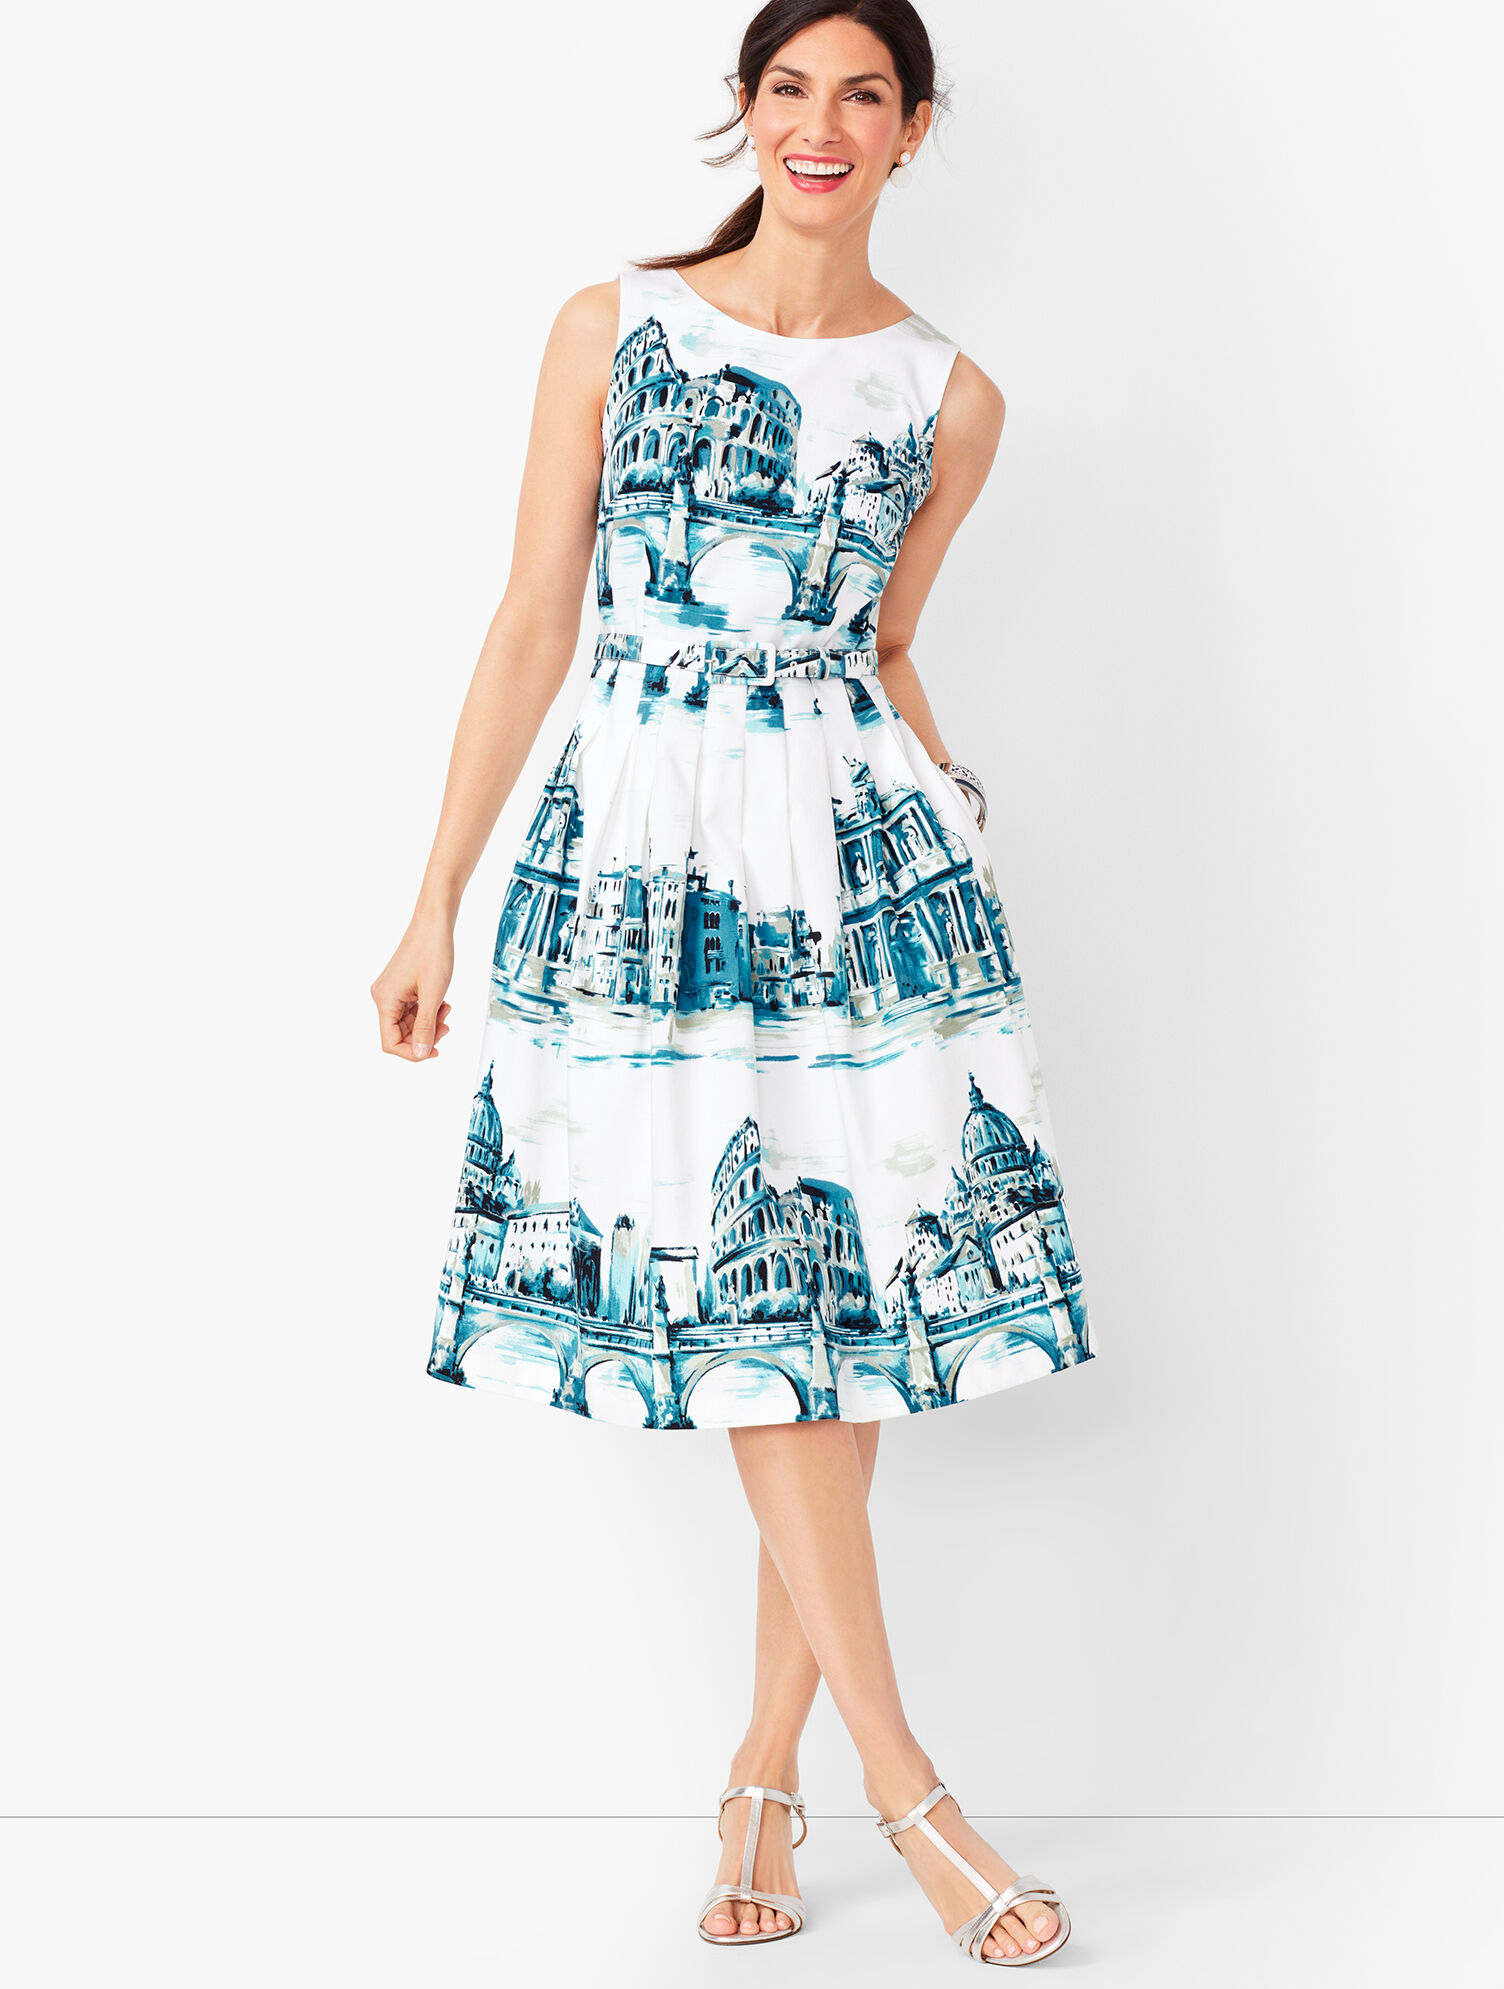 Talbots Plus spring summer sleeveless garden print cotton dress 3X